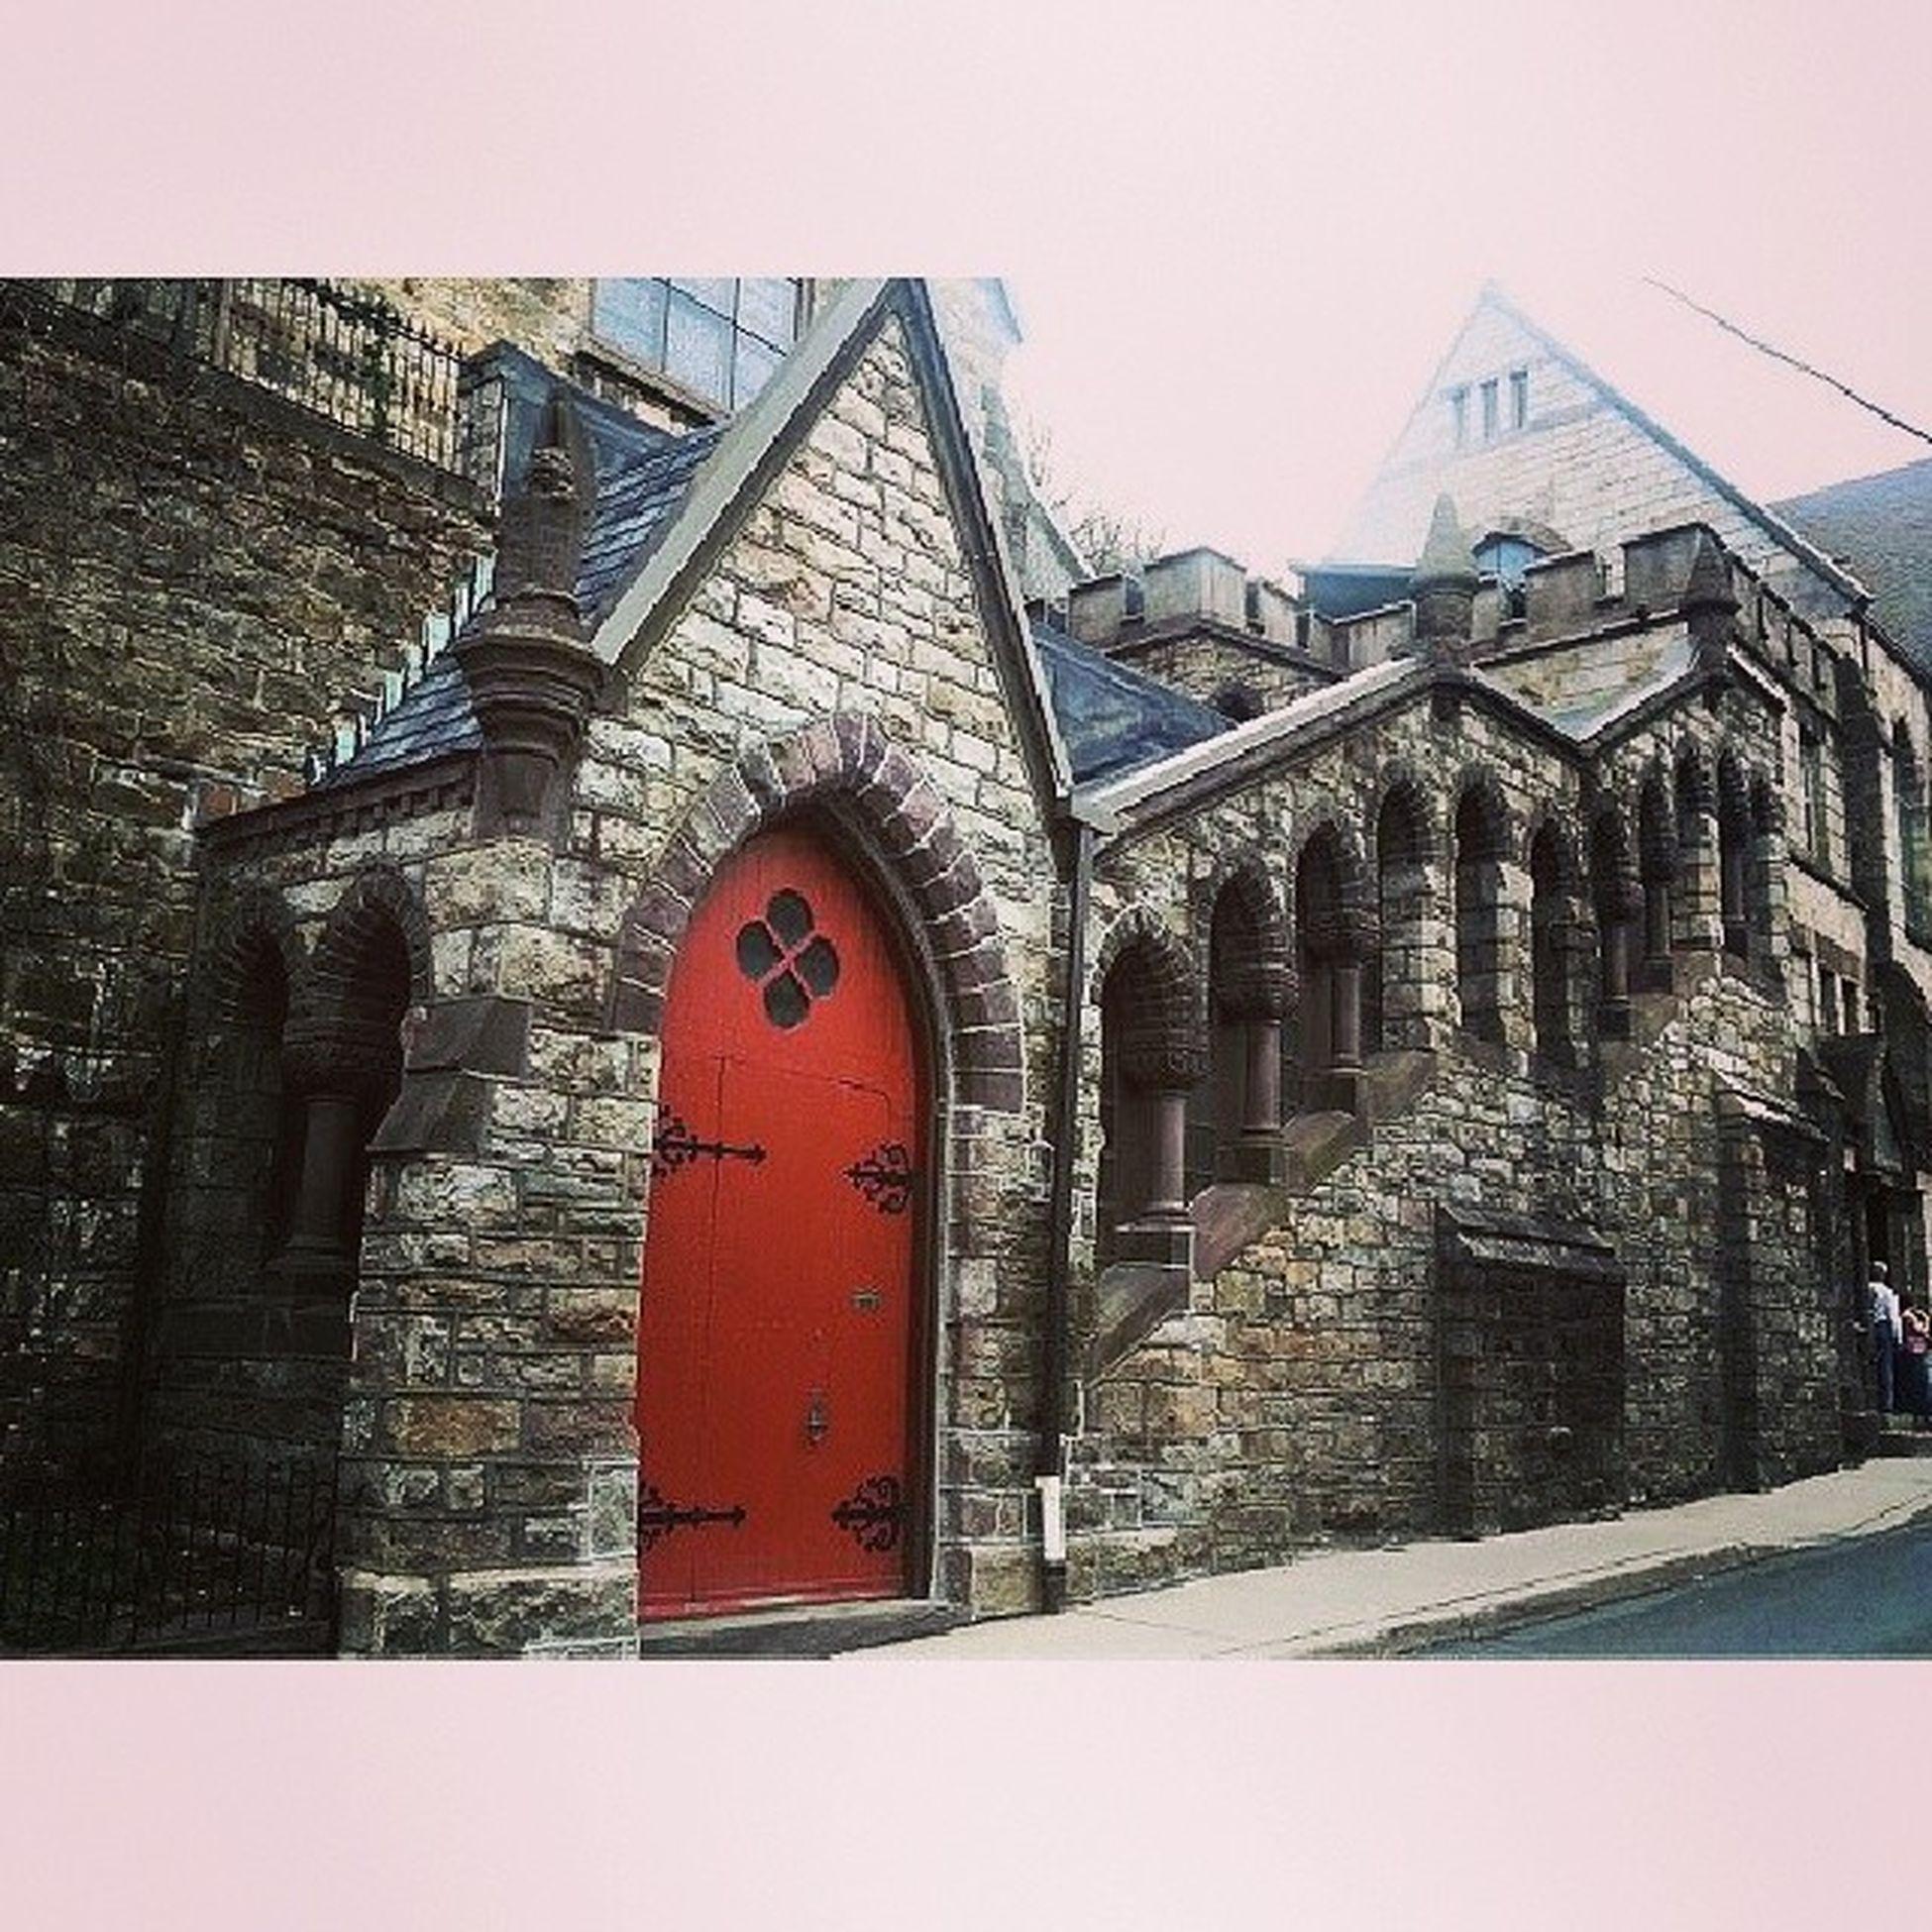 Saint Mark's Episcopal Church Racestreet Mauchchunk Asapacker Victorian gothic 1870s reddoor gigantic stone sprawling diadelosmuertos